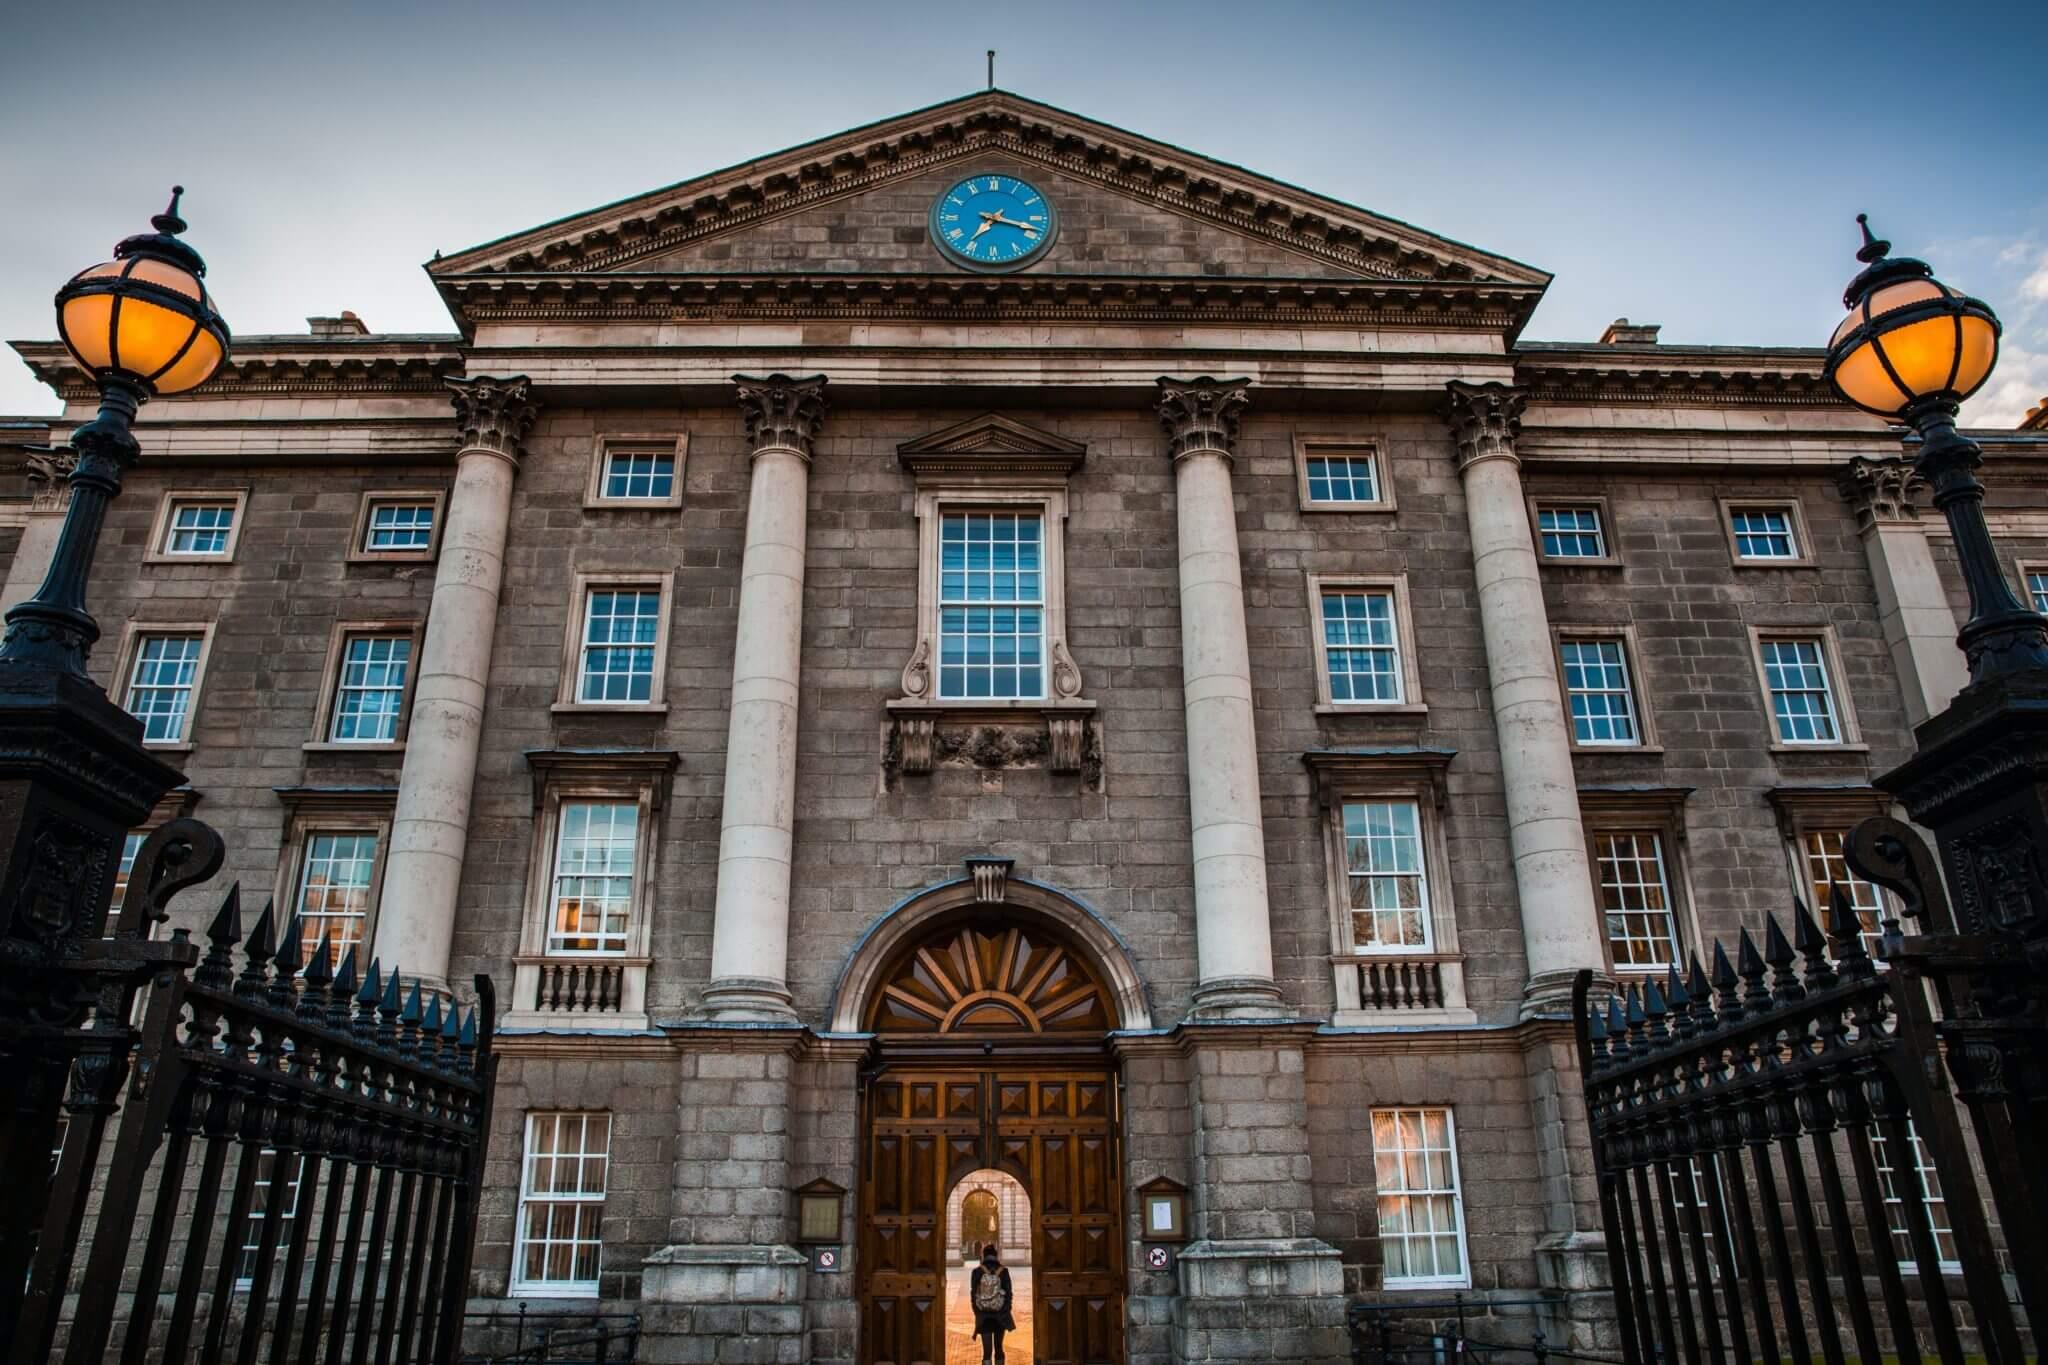 Trinity College Dublin - Photo by Stephen Bergin on Unsplash